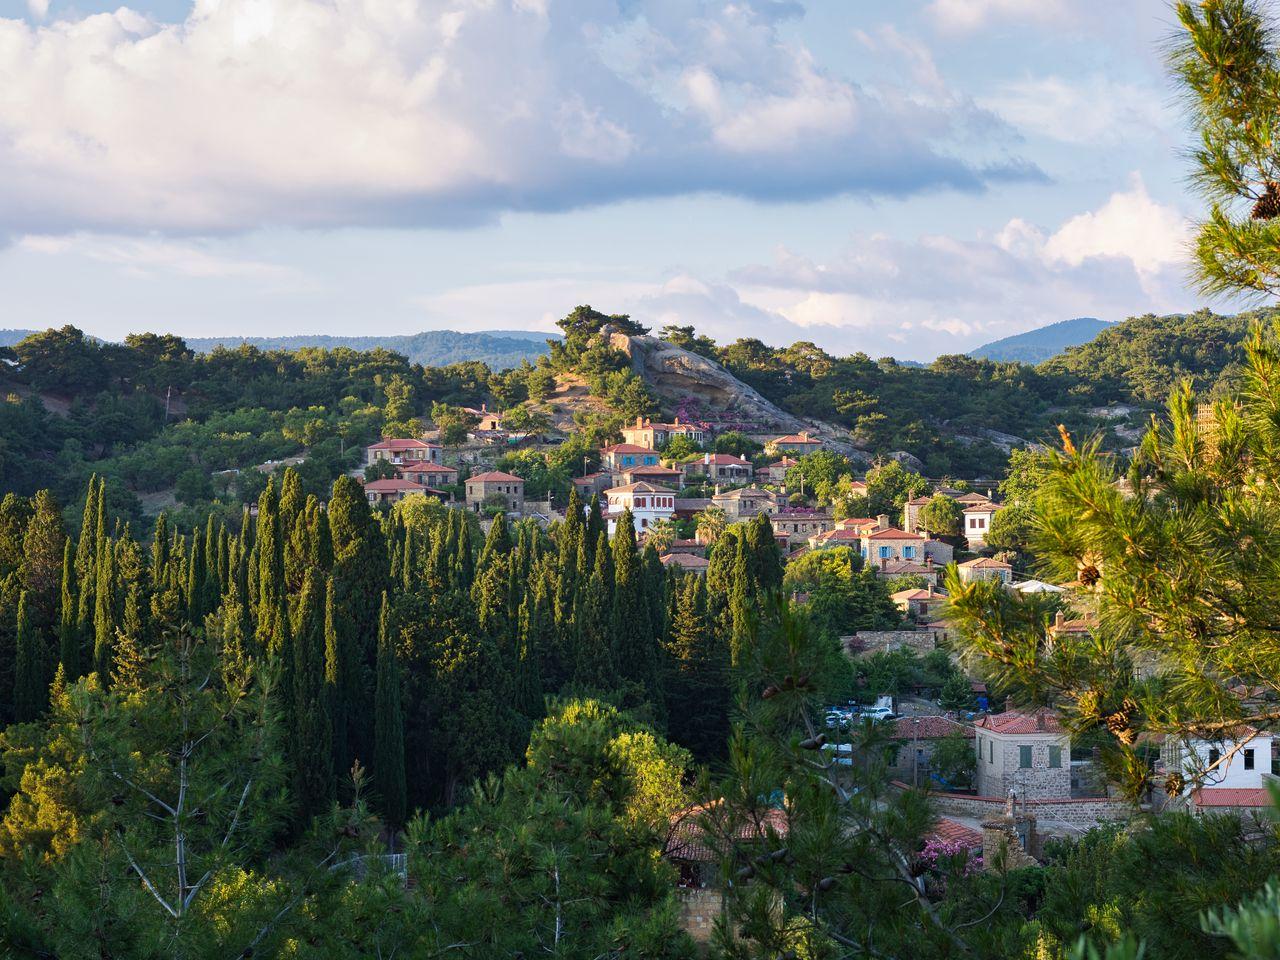 1280x960 Wallpaper village, mountain, buildings, trees